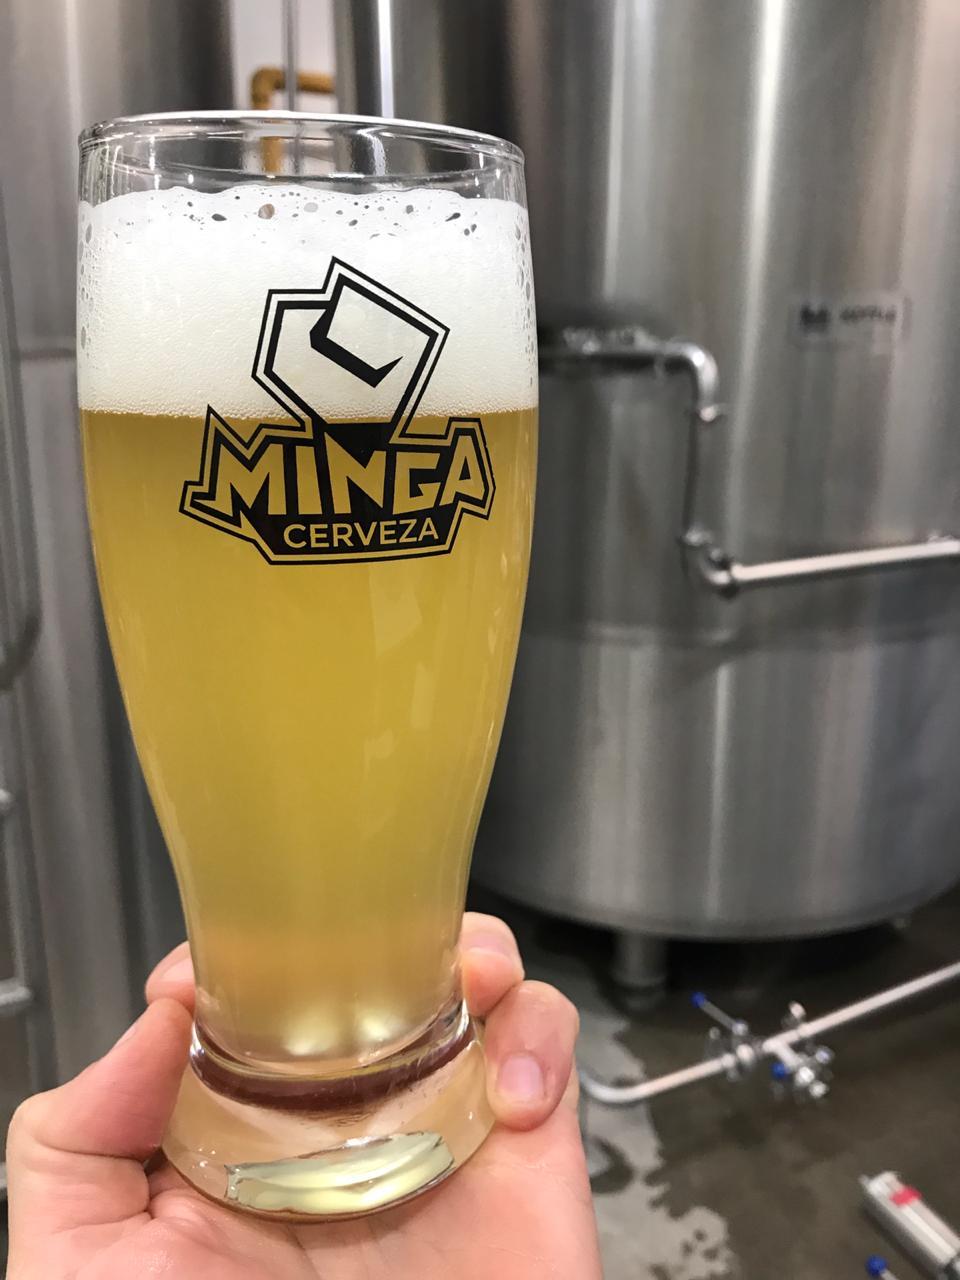 minga hazy lager